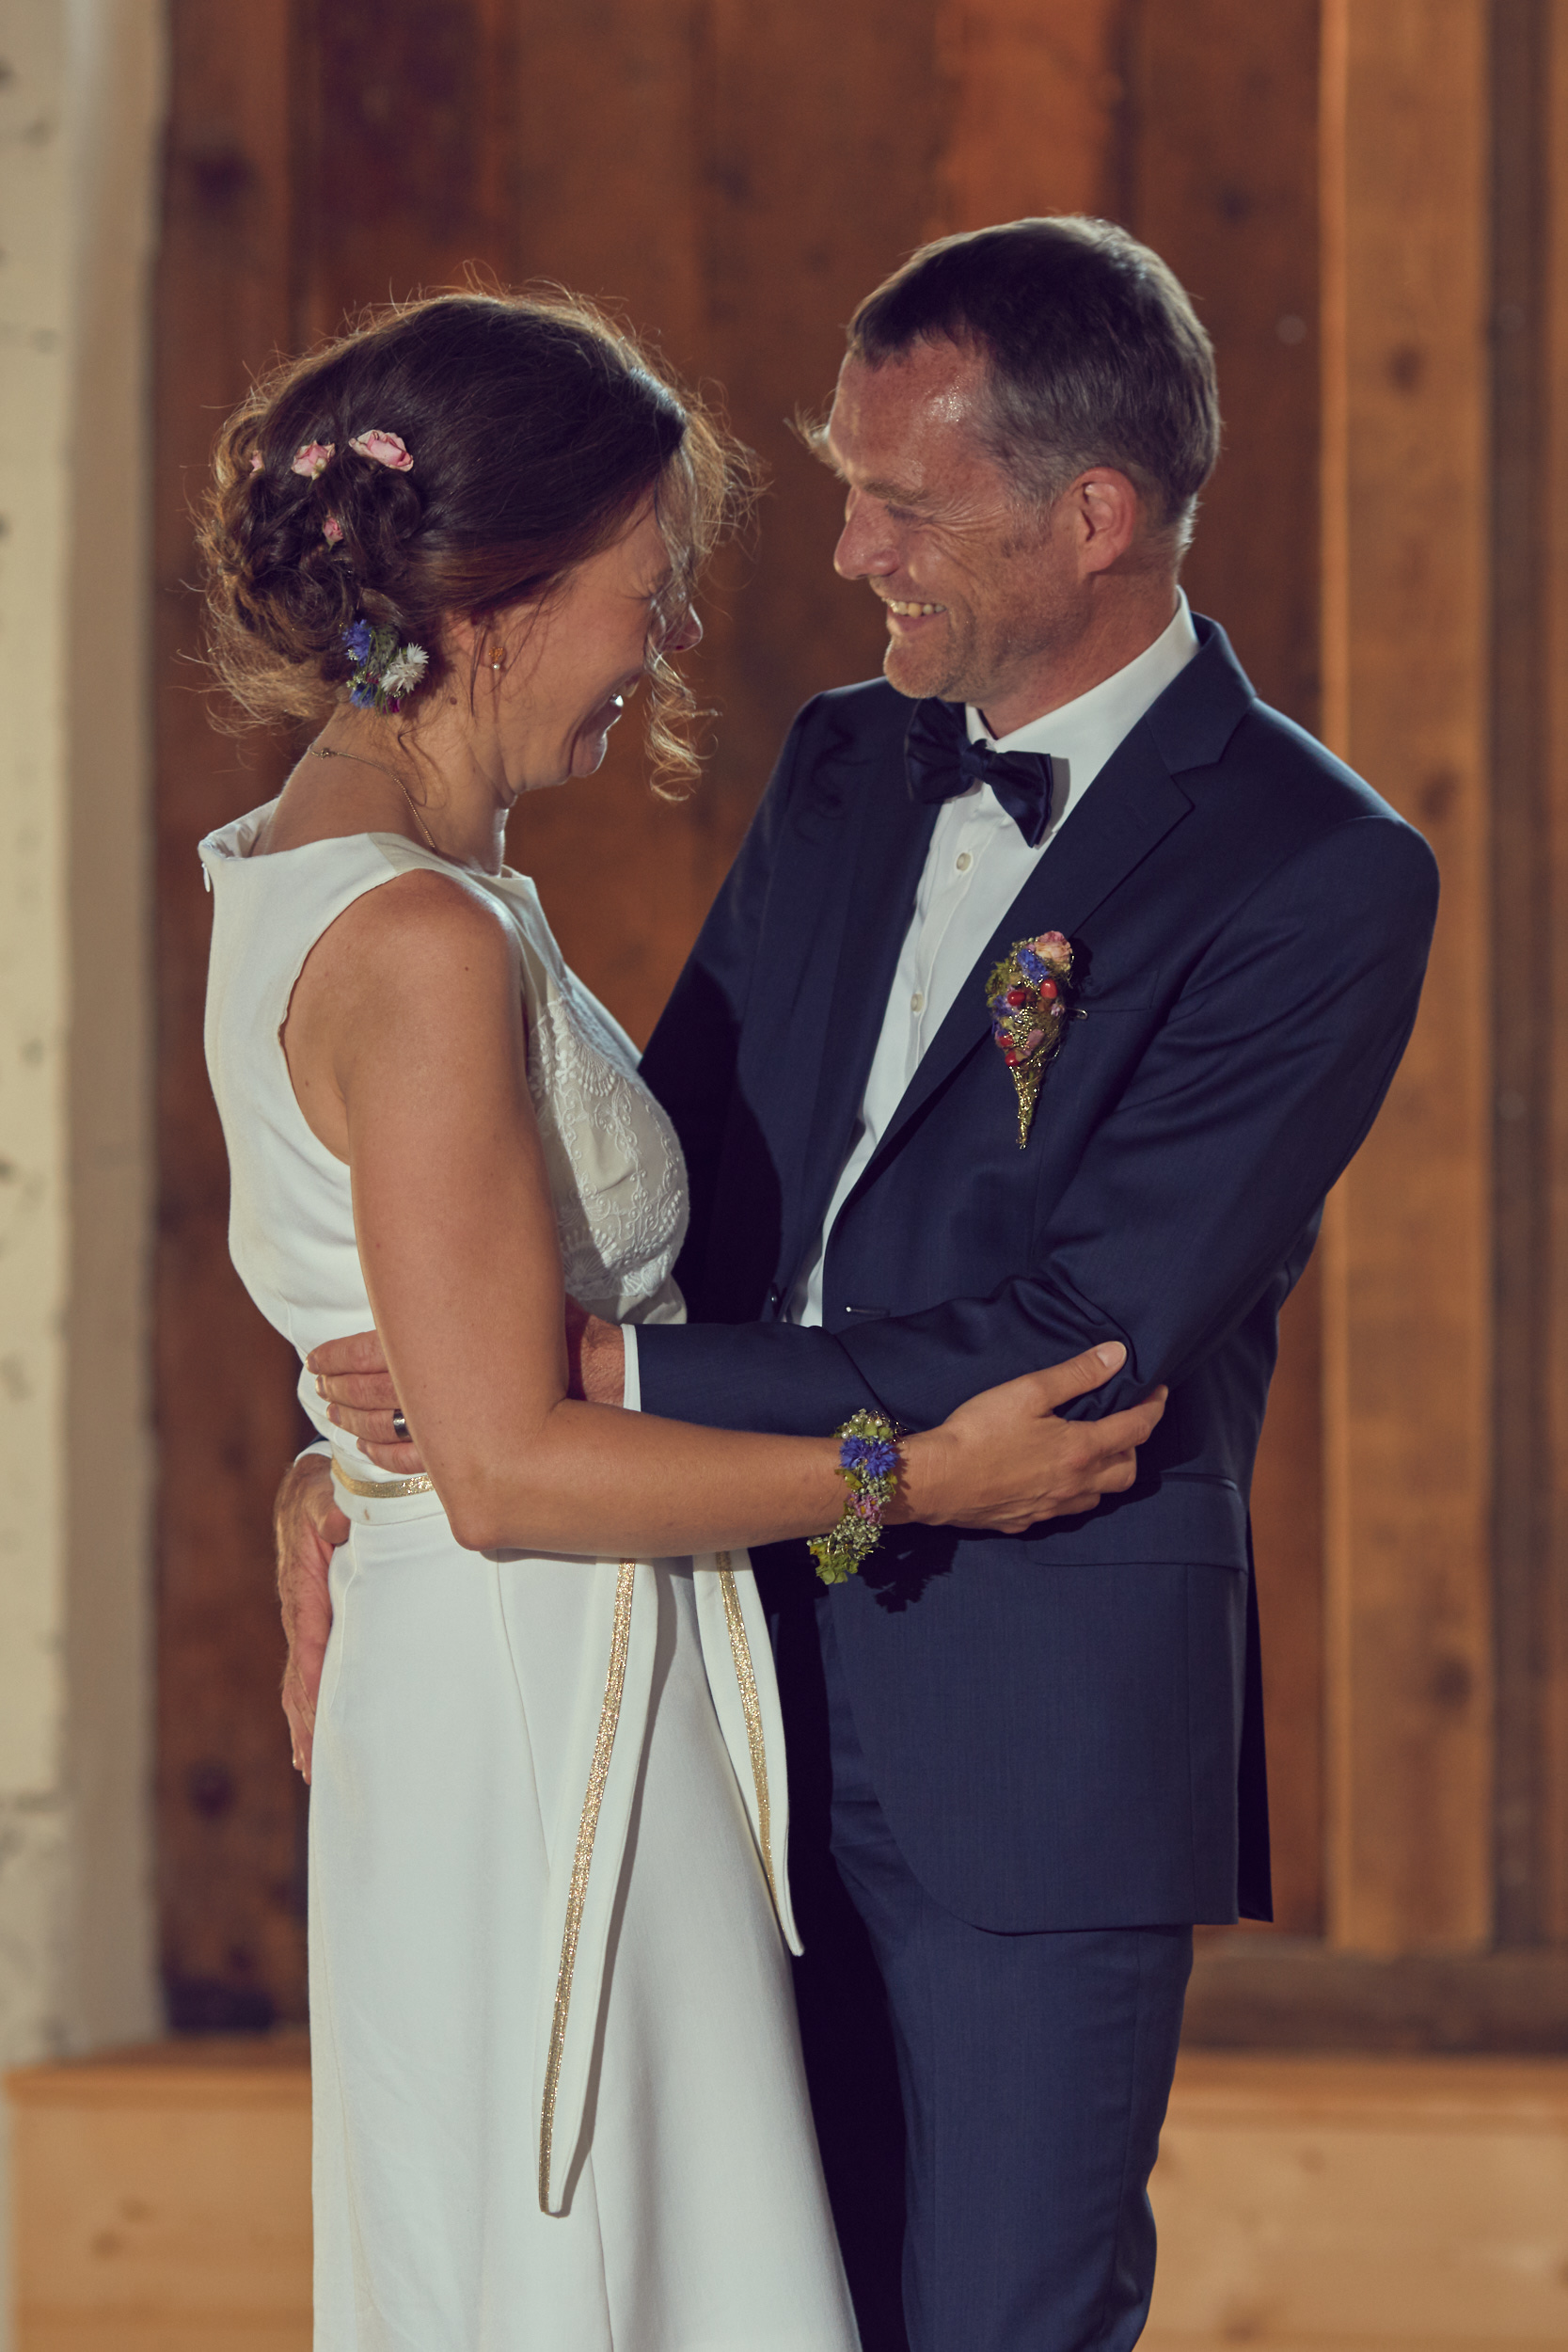 135 mm - 2018-07-27 17.55.54 - Hochzeit Andrea & Jochen Fotoshooting.jpg